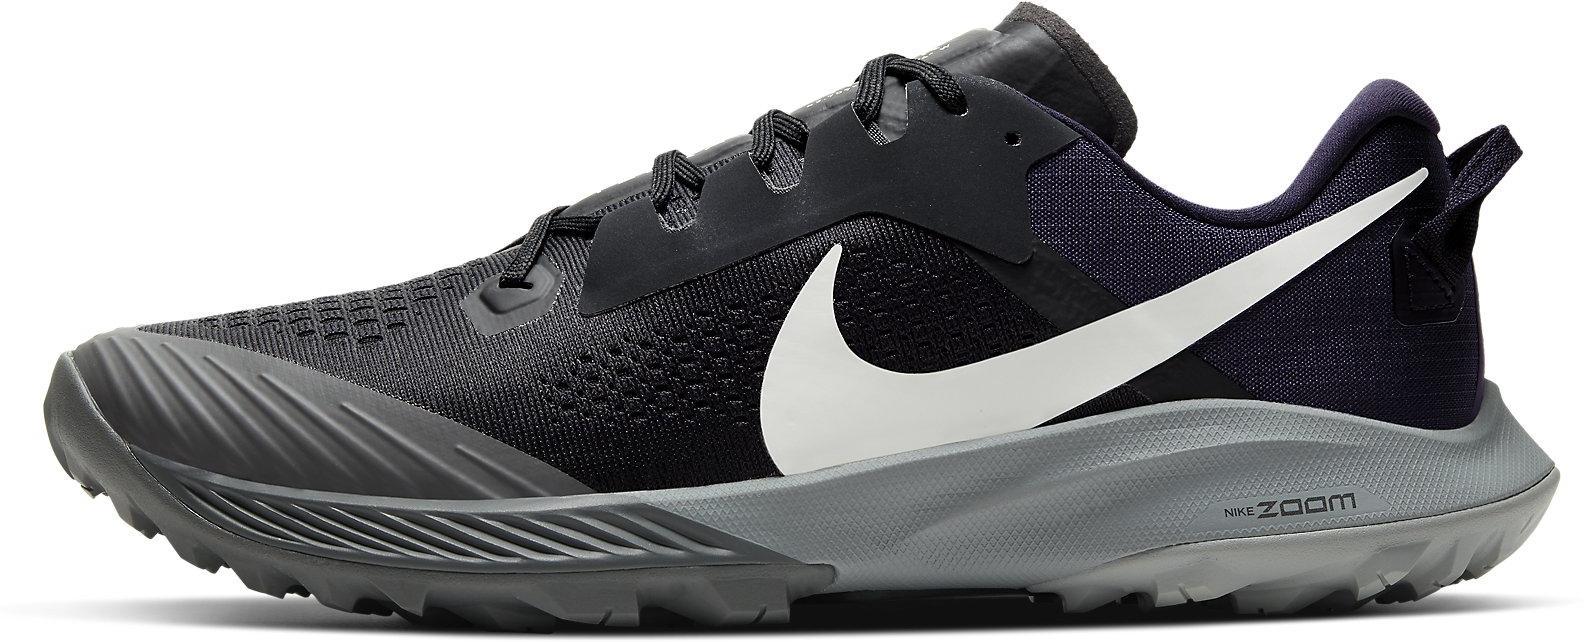 Trail shoes Nike AIR ZOOM TERRA KIGER 6